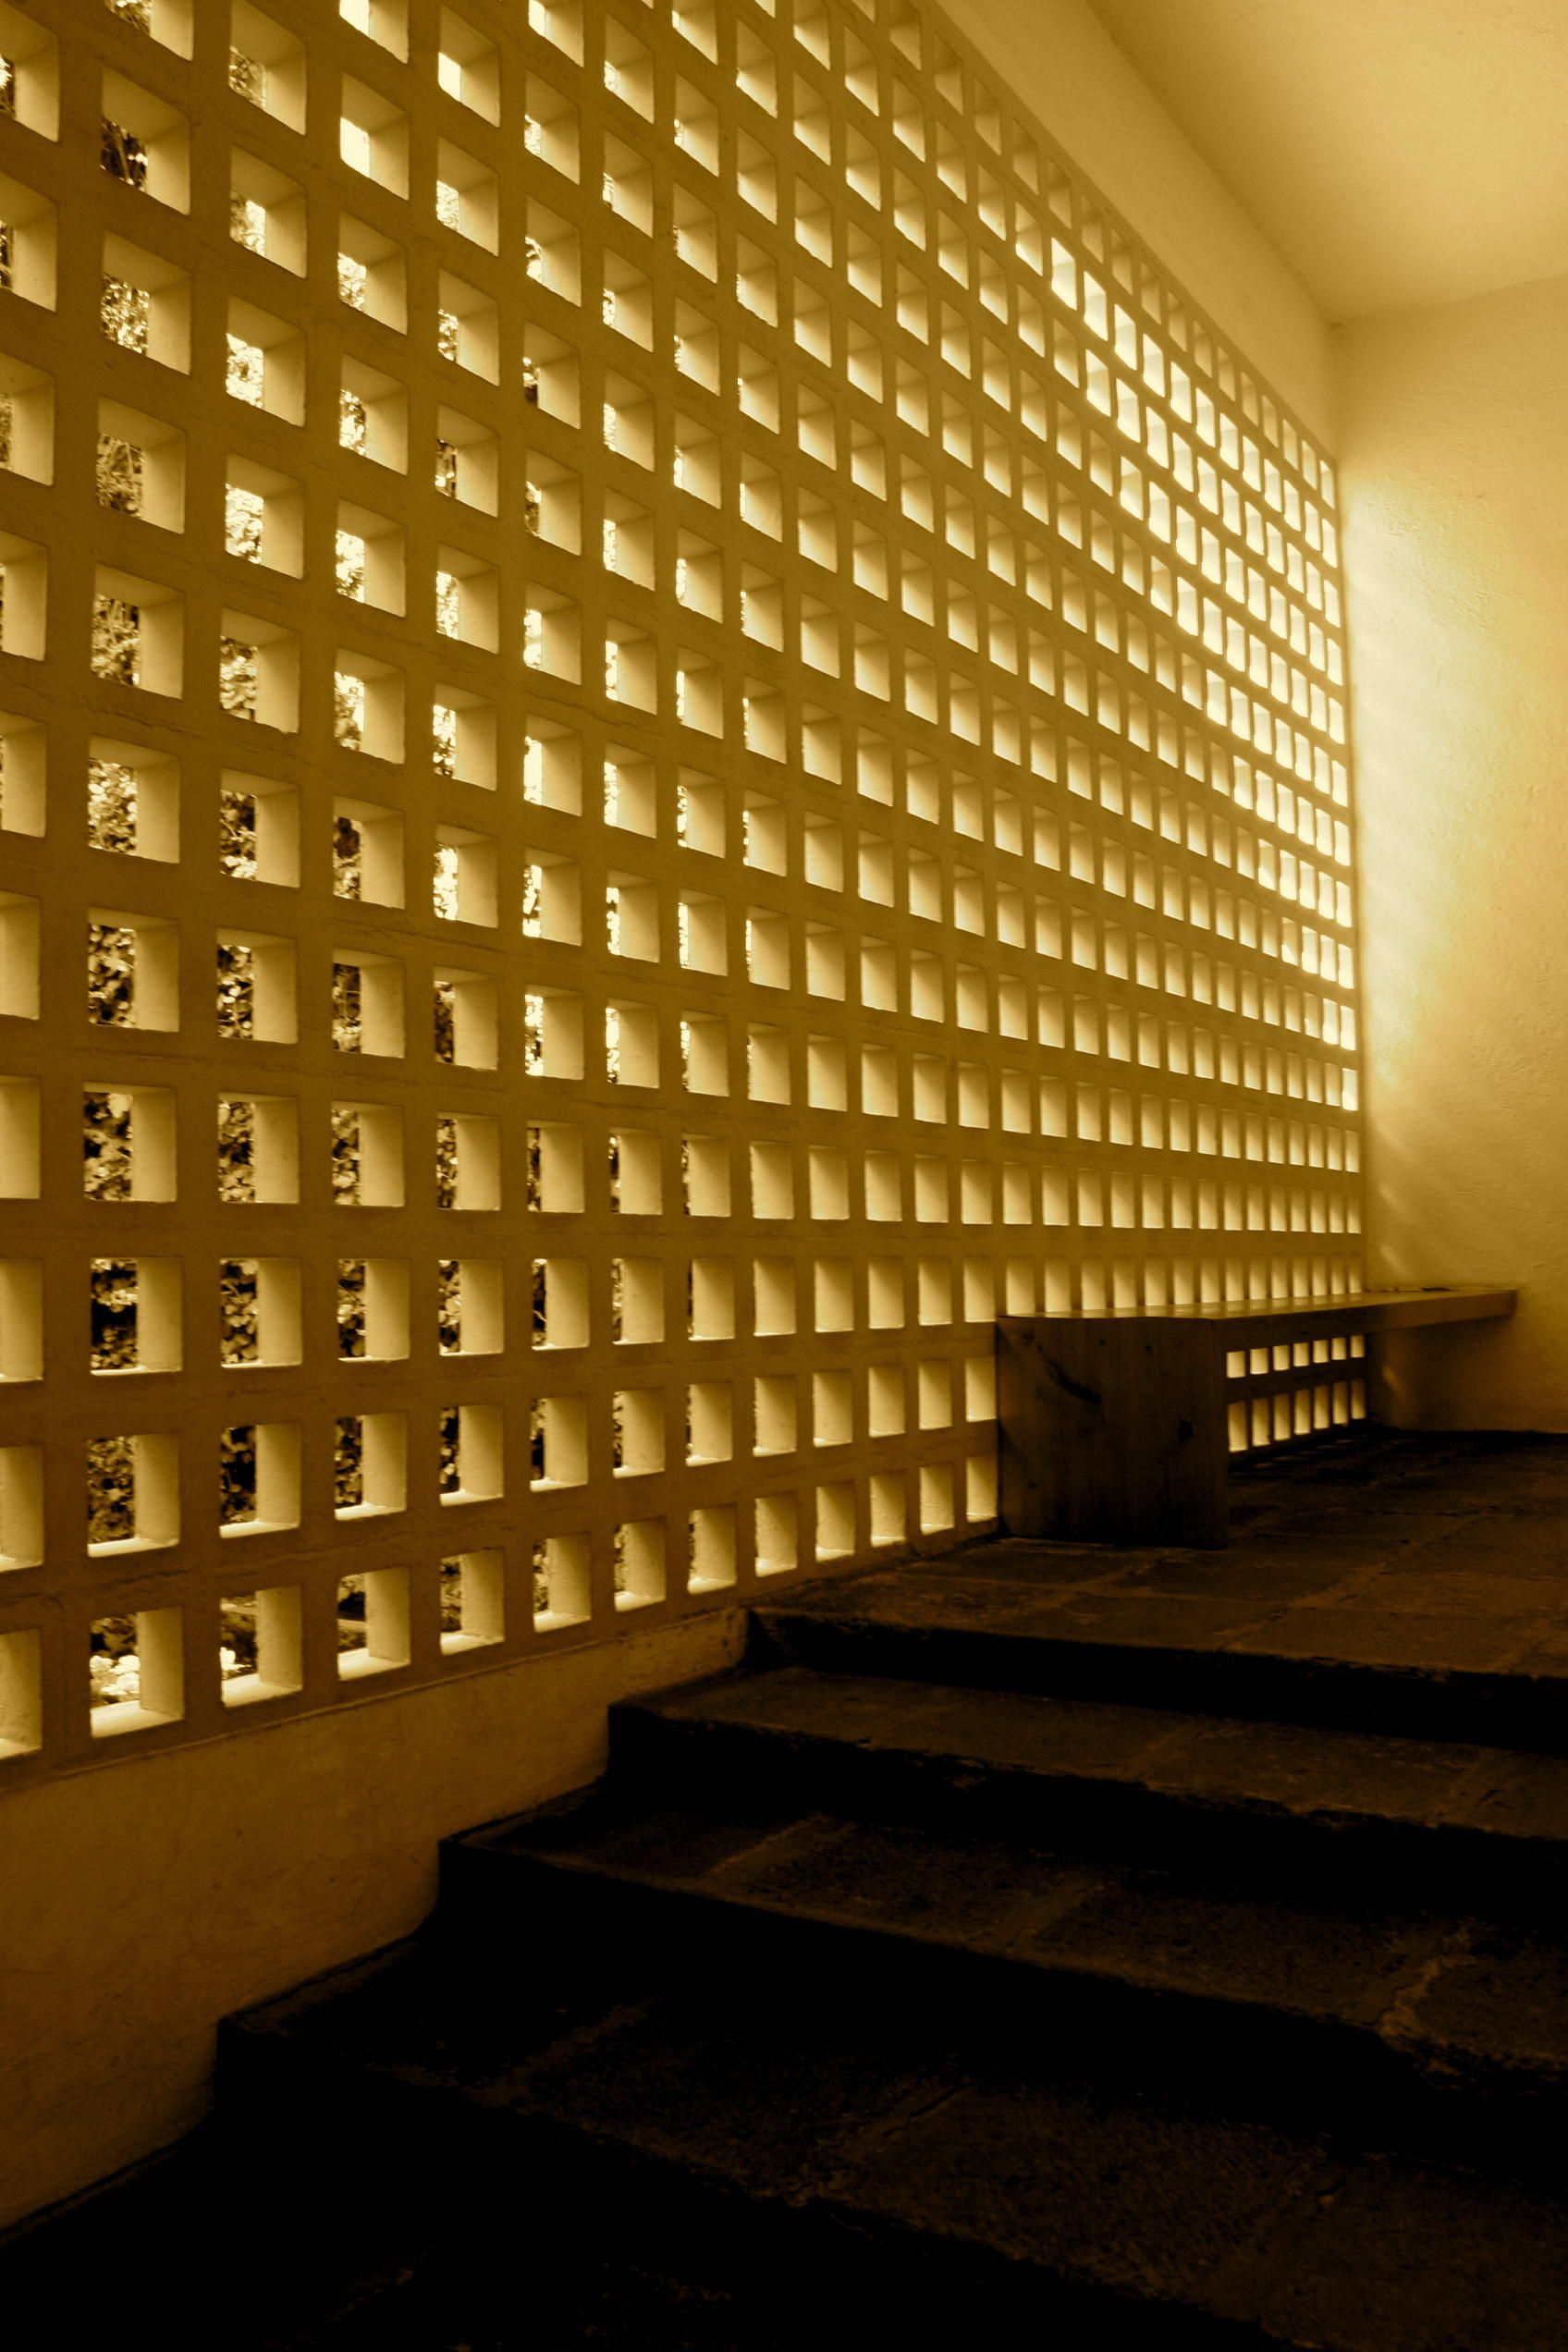 Arquitectura p gina web de dagmarstudy celosia for Arquitectura pagina web